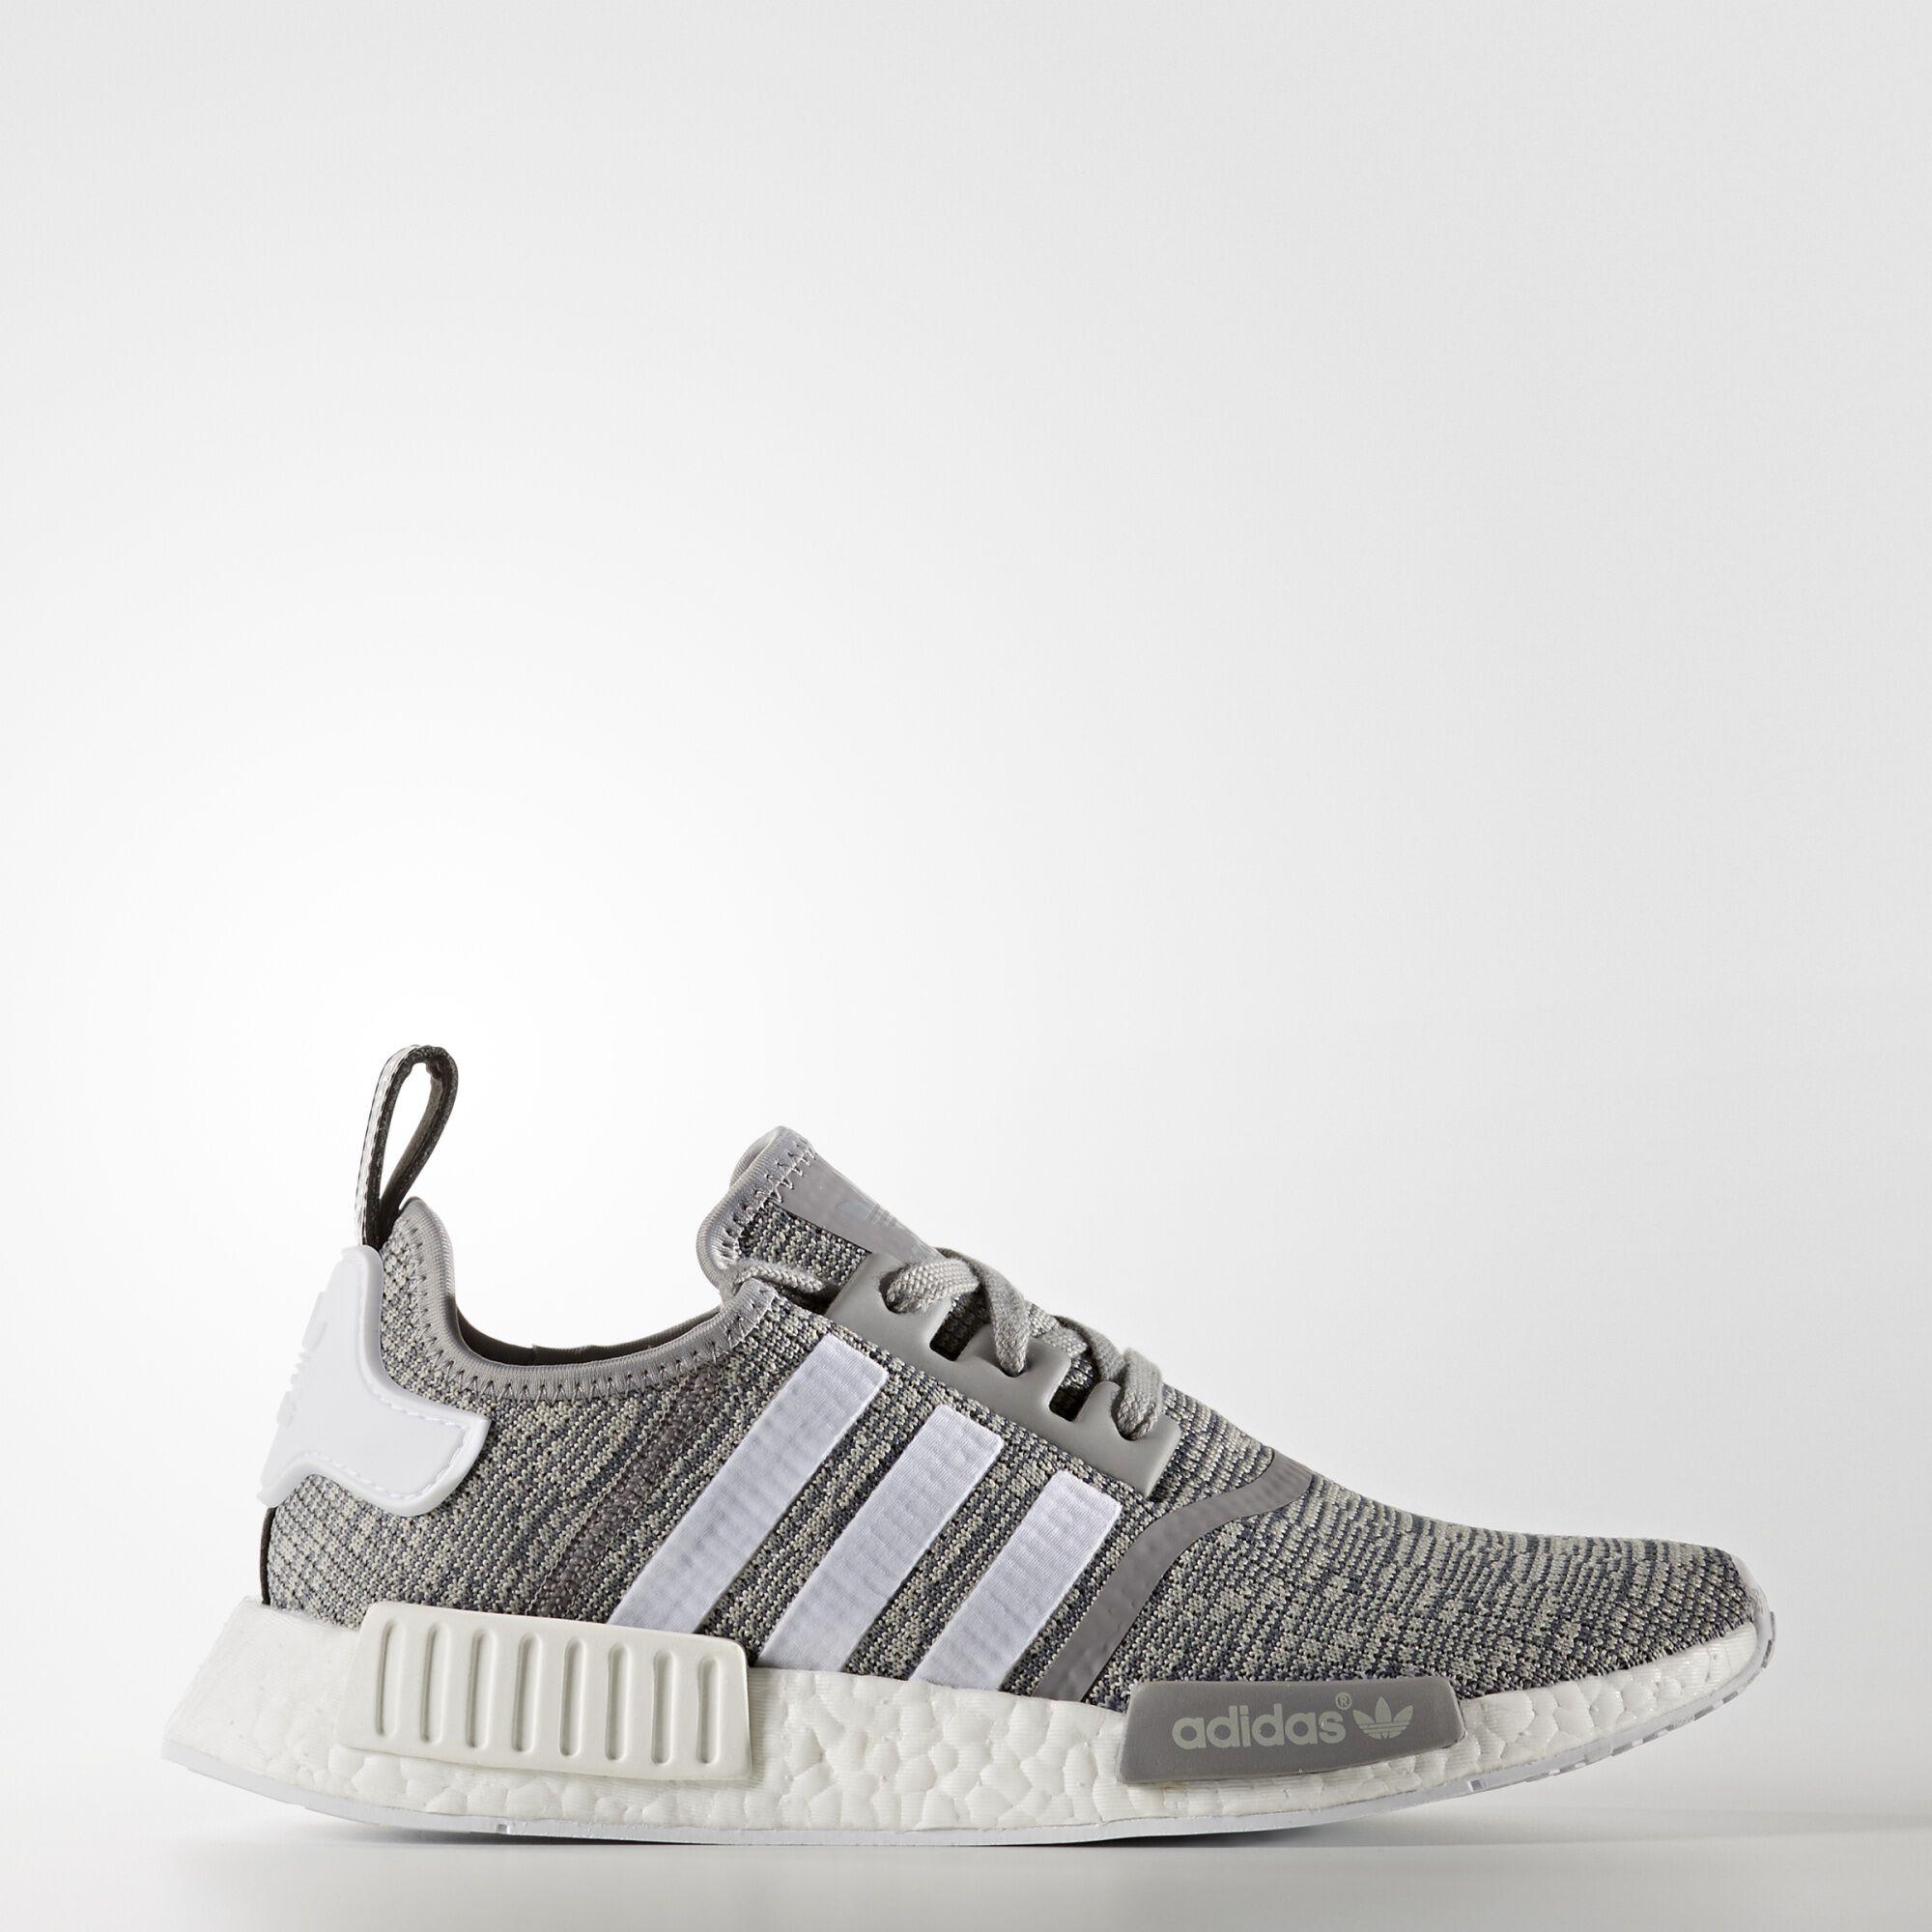 Nmd R1 Grey